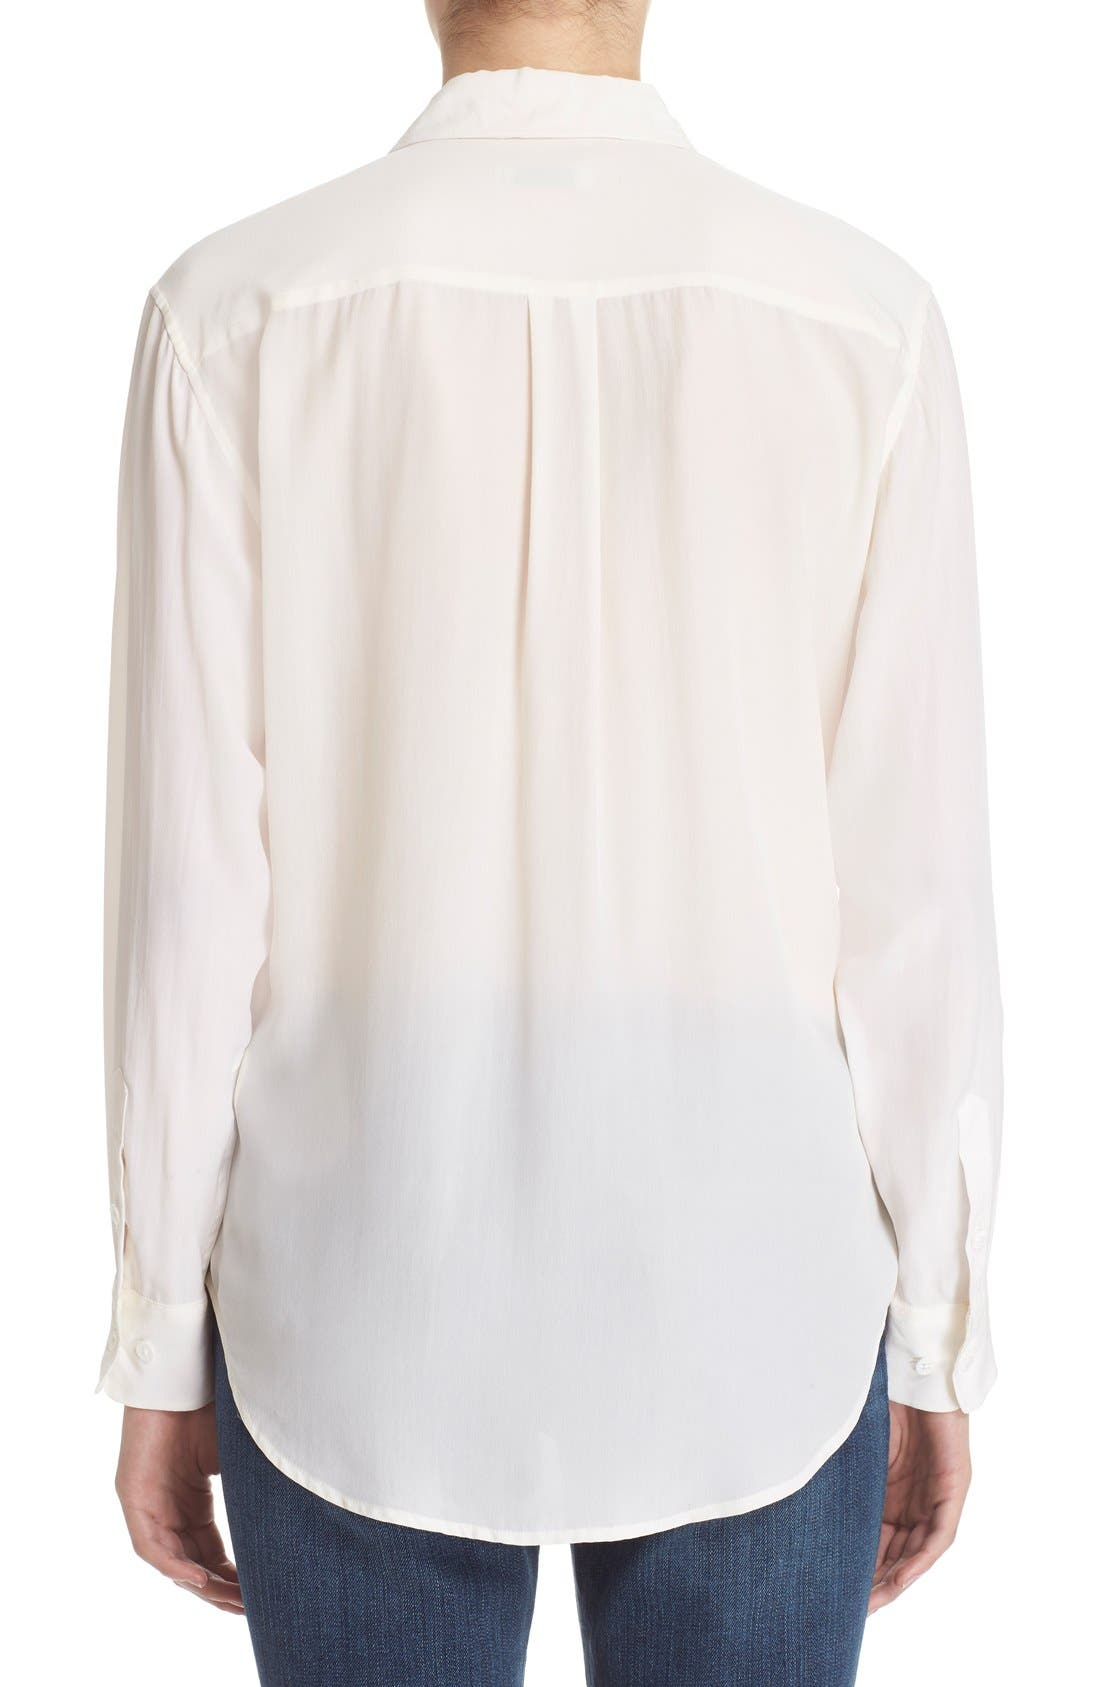 'Signature' Silk Shirt,                             Alternate thumbnail 2, color,                             Bright White